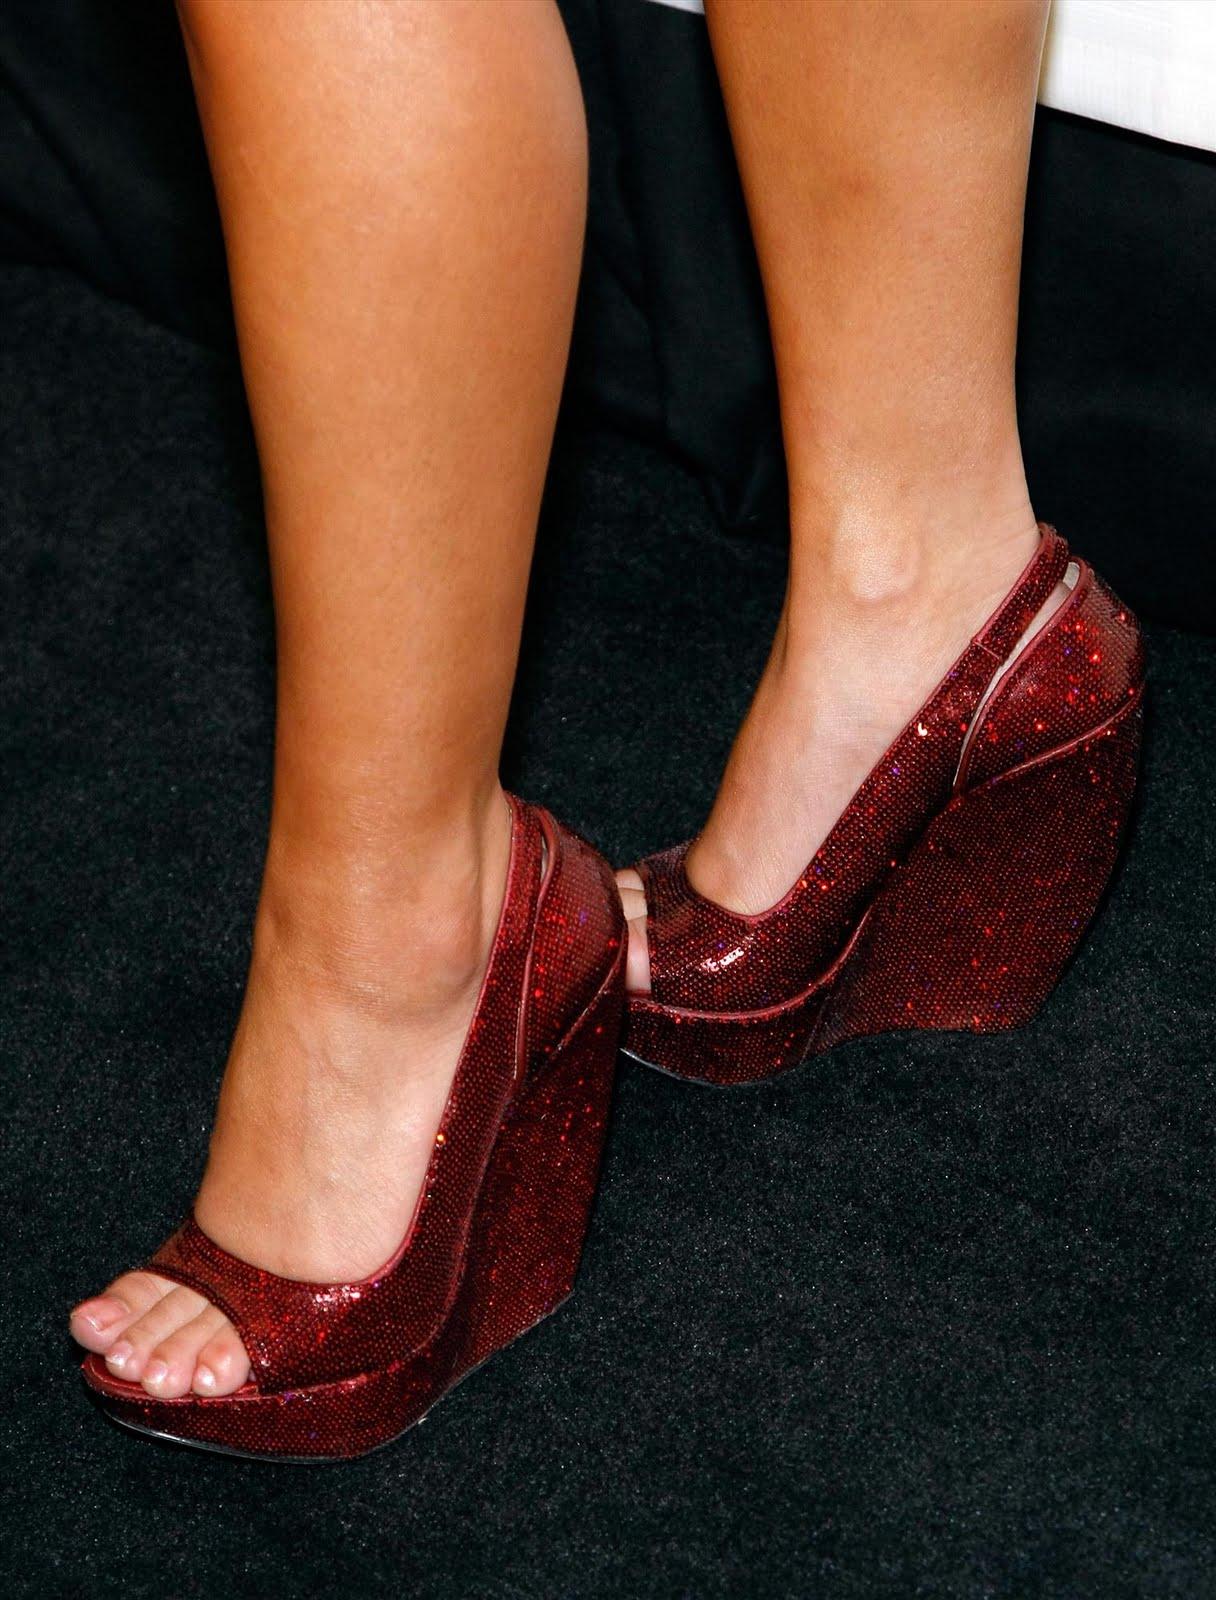 http://2.bp.blogspot.com/_UaLWp72nij4/TFcvH8HB-JI/AAAAAAAAS24/7BDVmMG3BOk/s1600/tila-tequila-feet-2.jpg